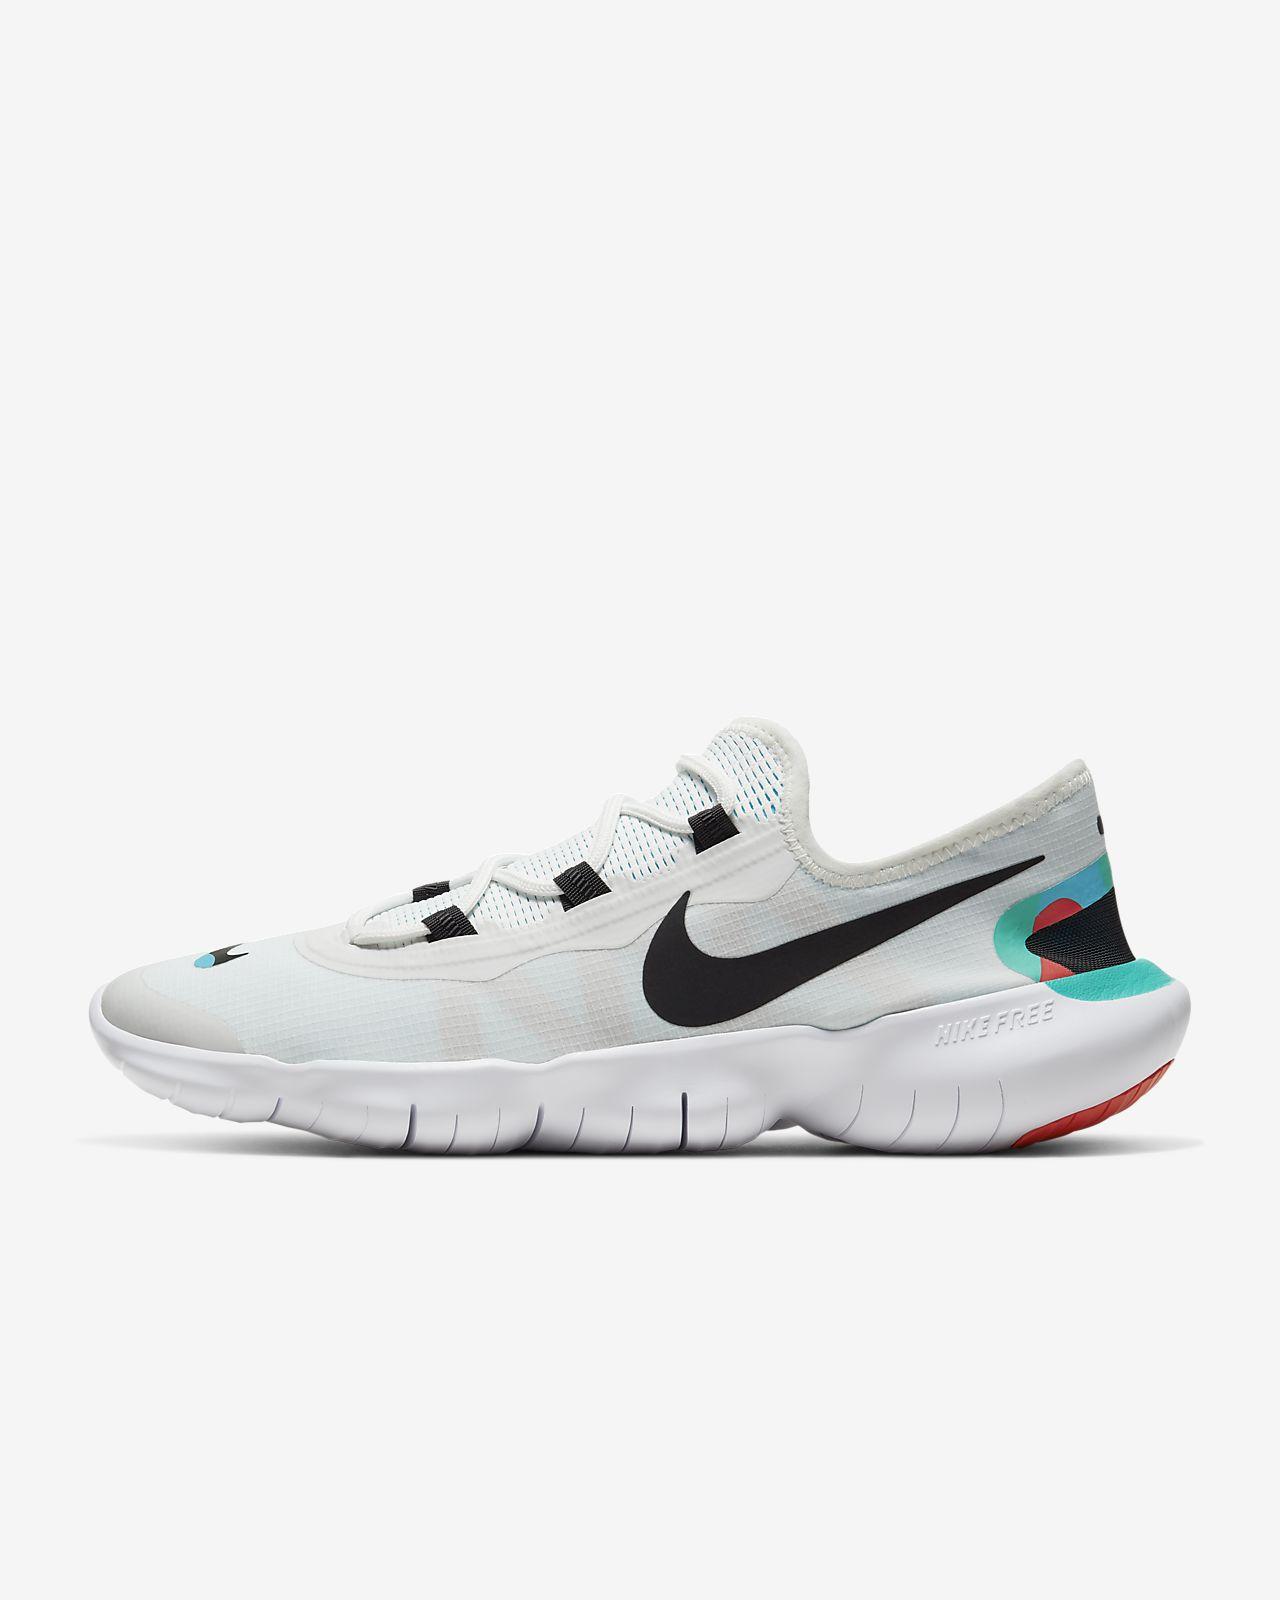 14 Best nike free 5.0 images   Nike free, Nike, Nike free shoes